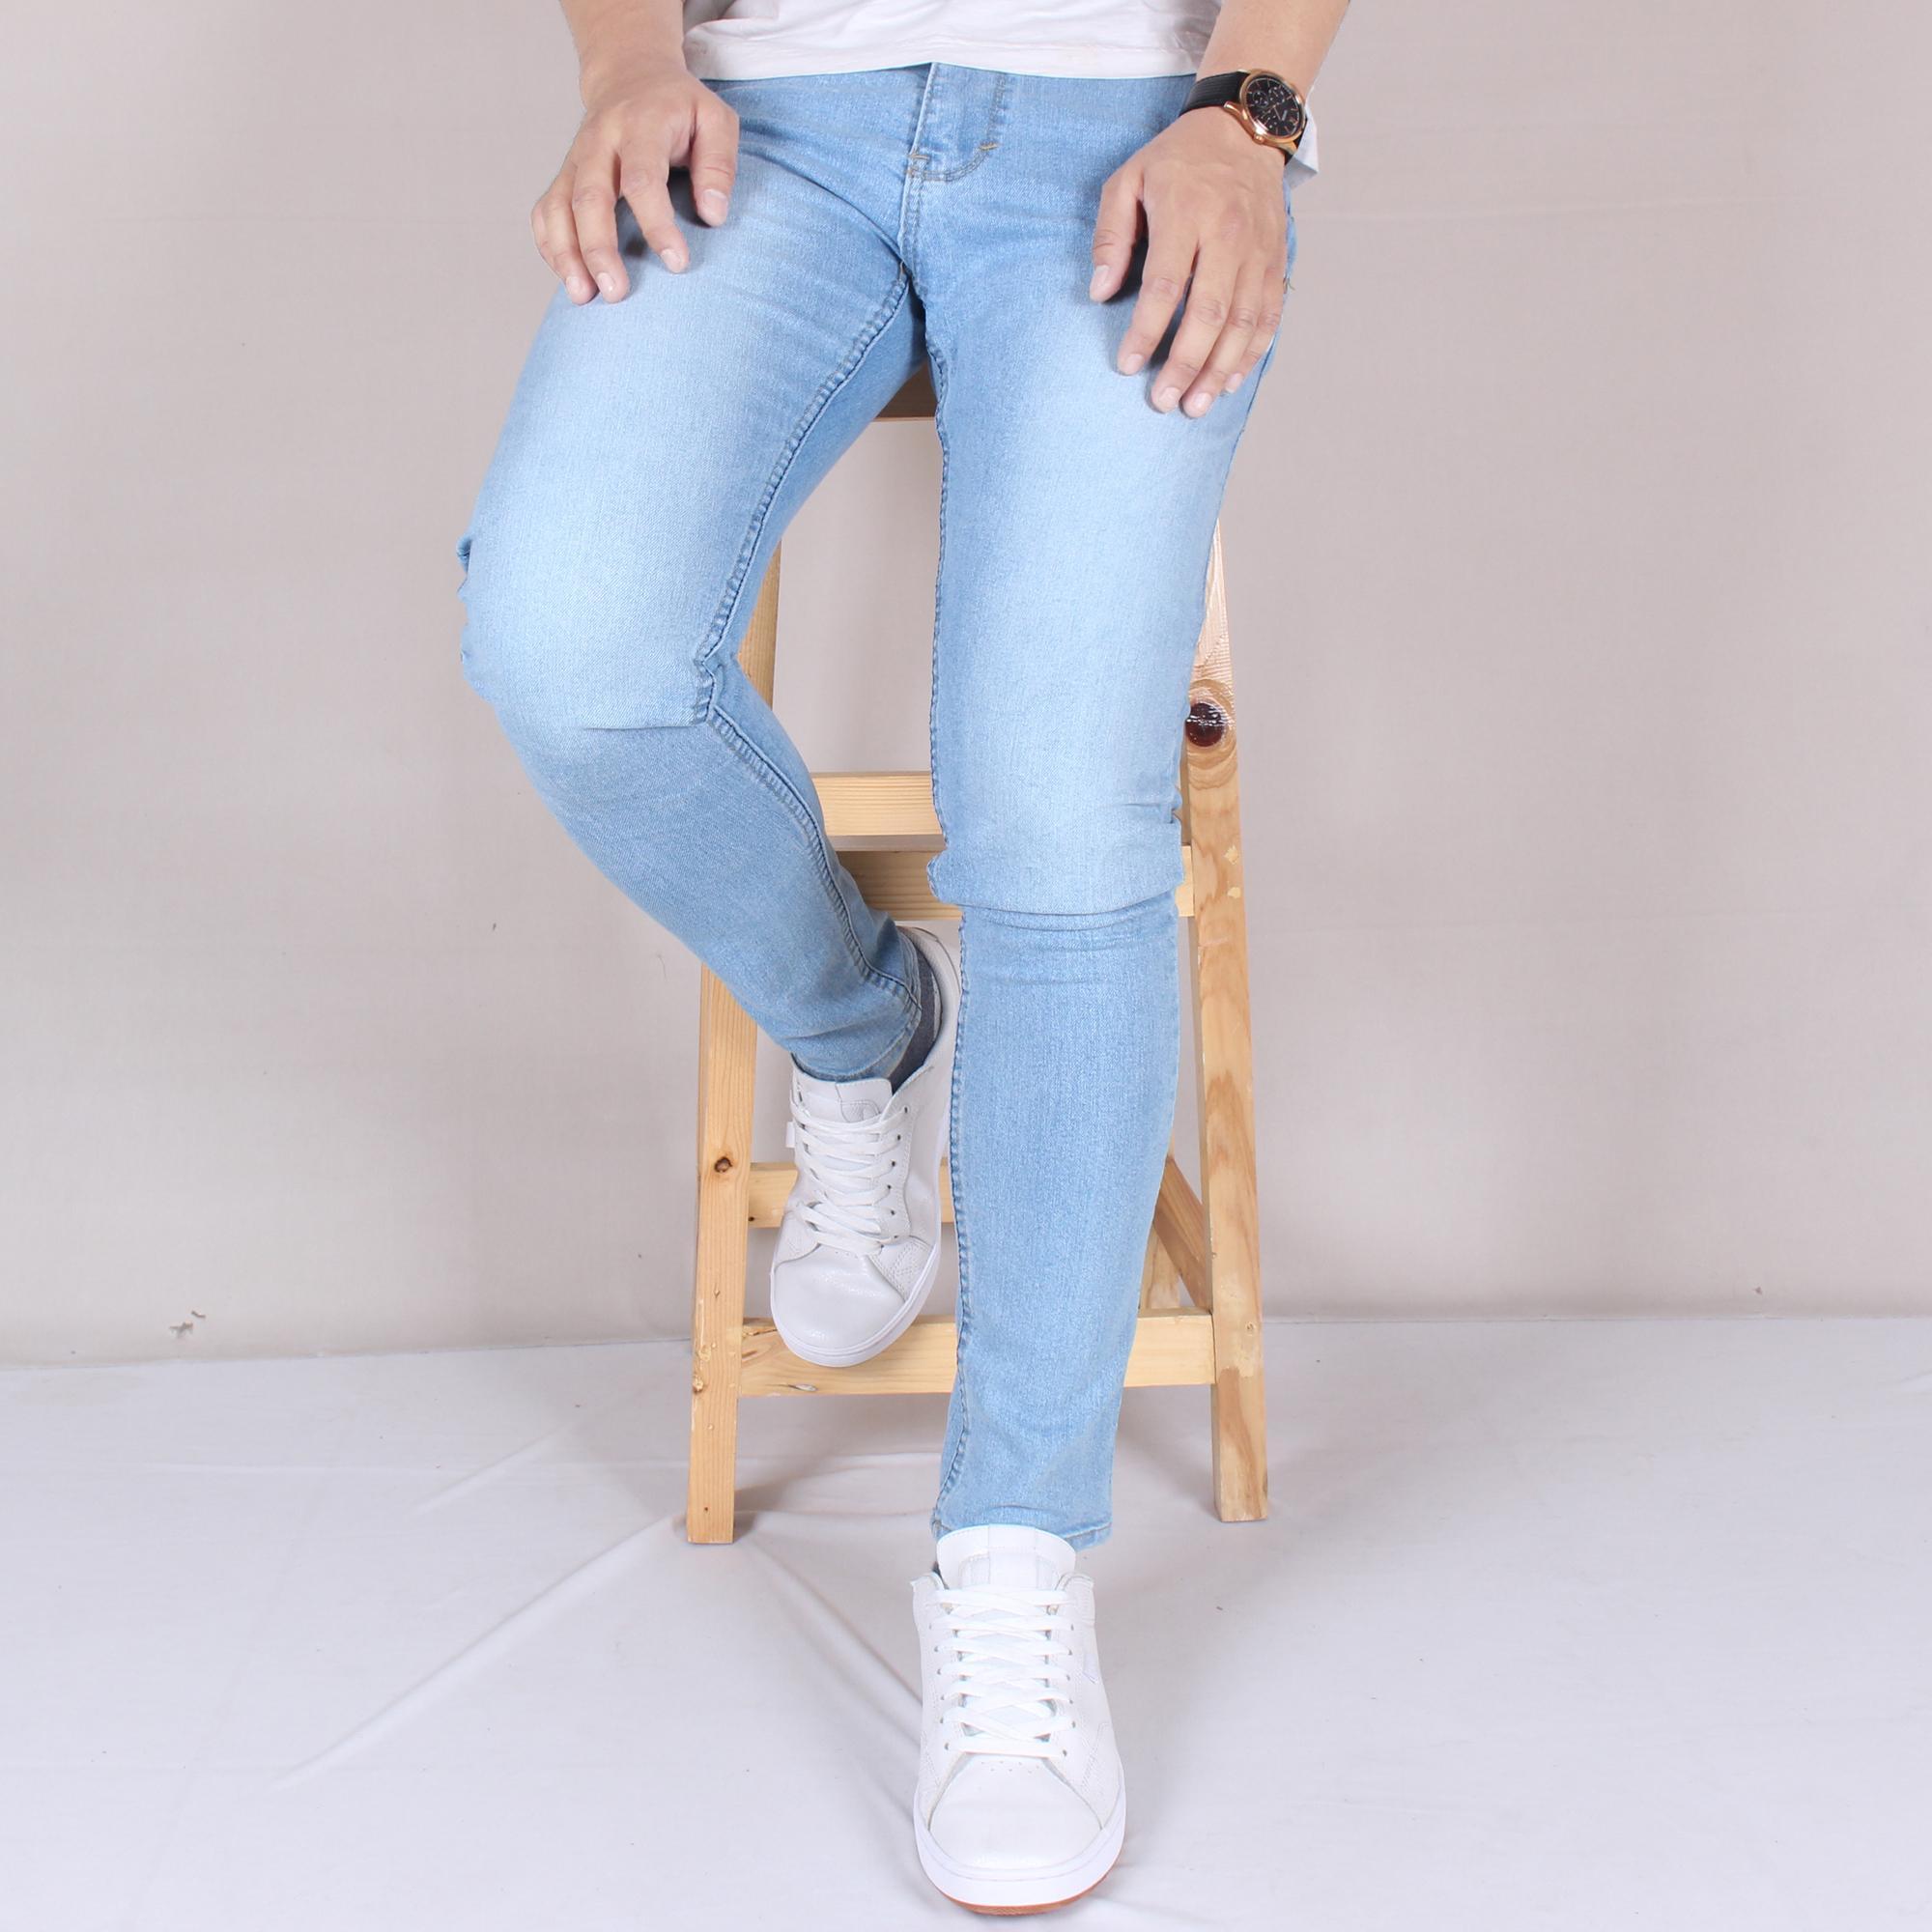 ... Zs-fashion 6008 Celena Jeans Panjang Pria Celana Jeans Skinny Cowok Skinny Jeans Blue Sky